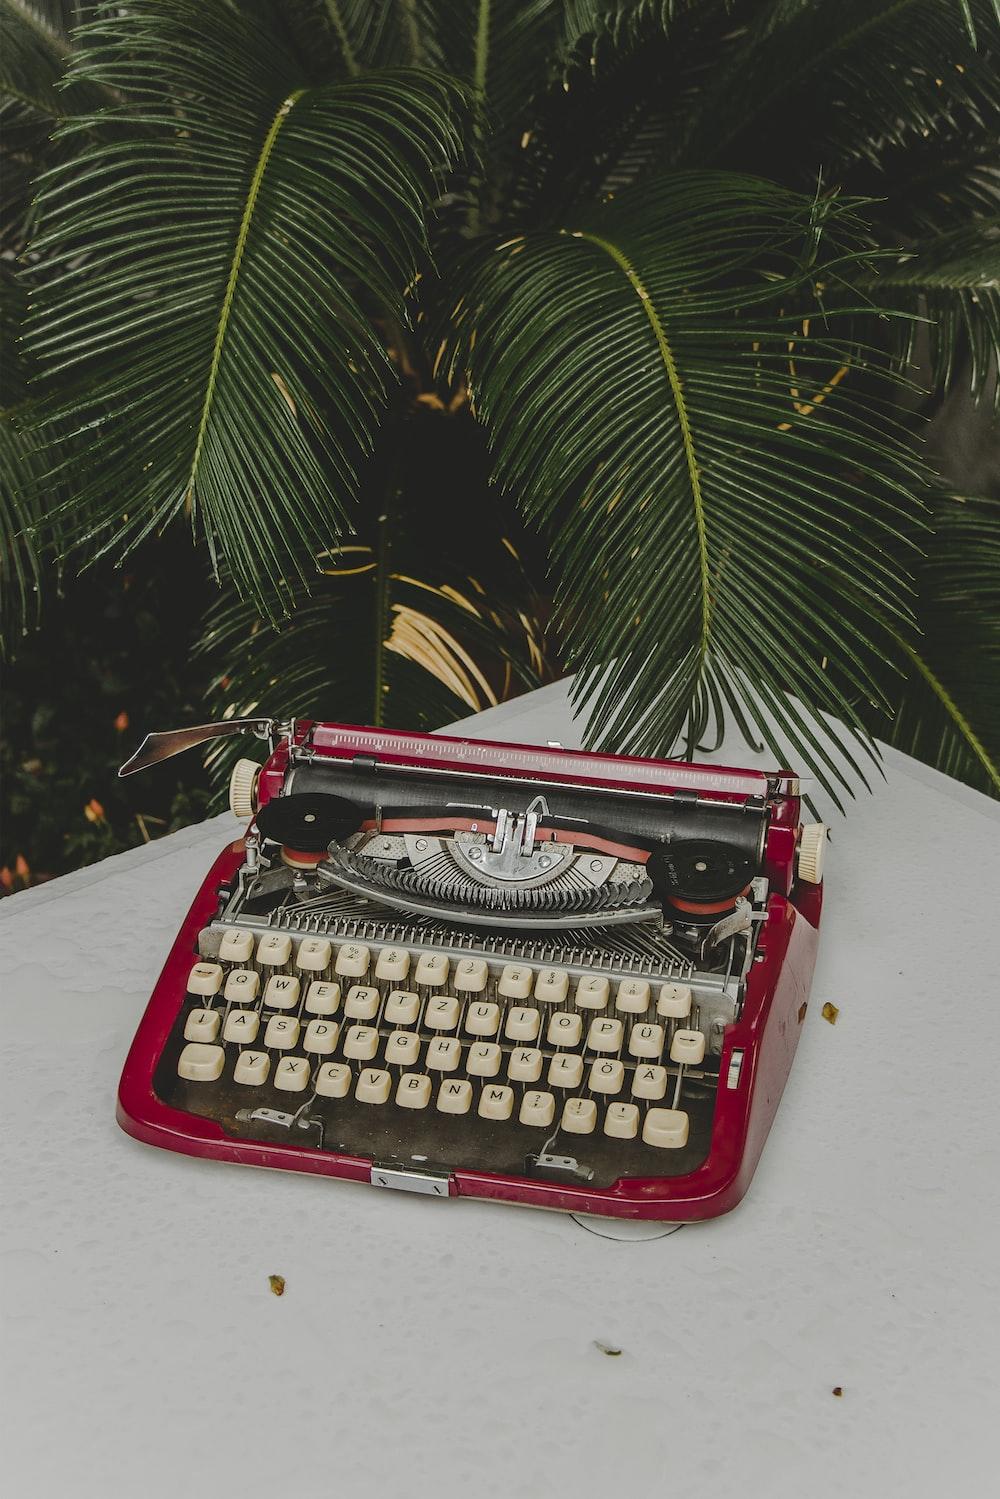 red and gray typewriter